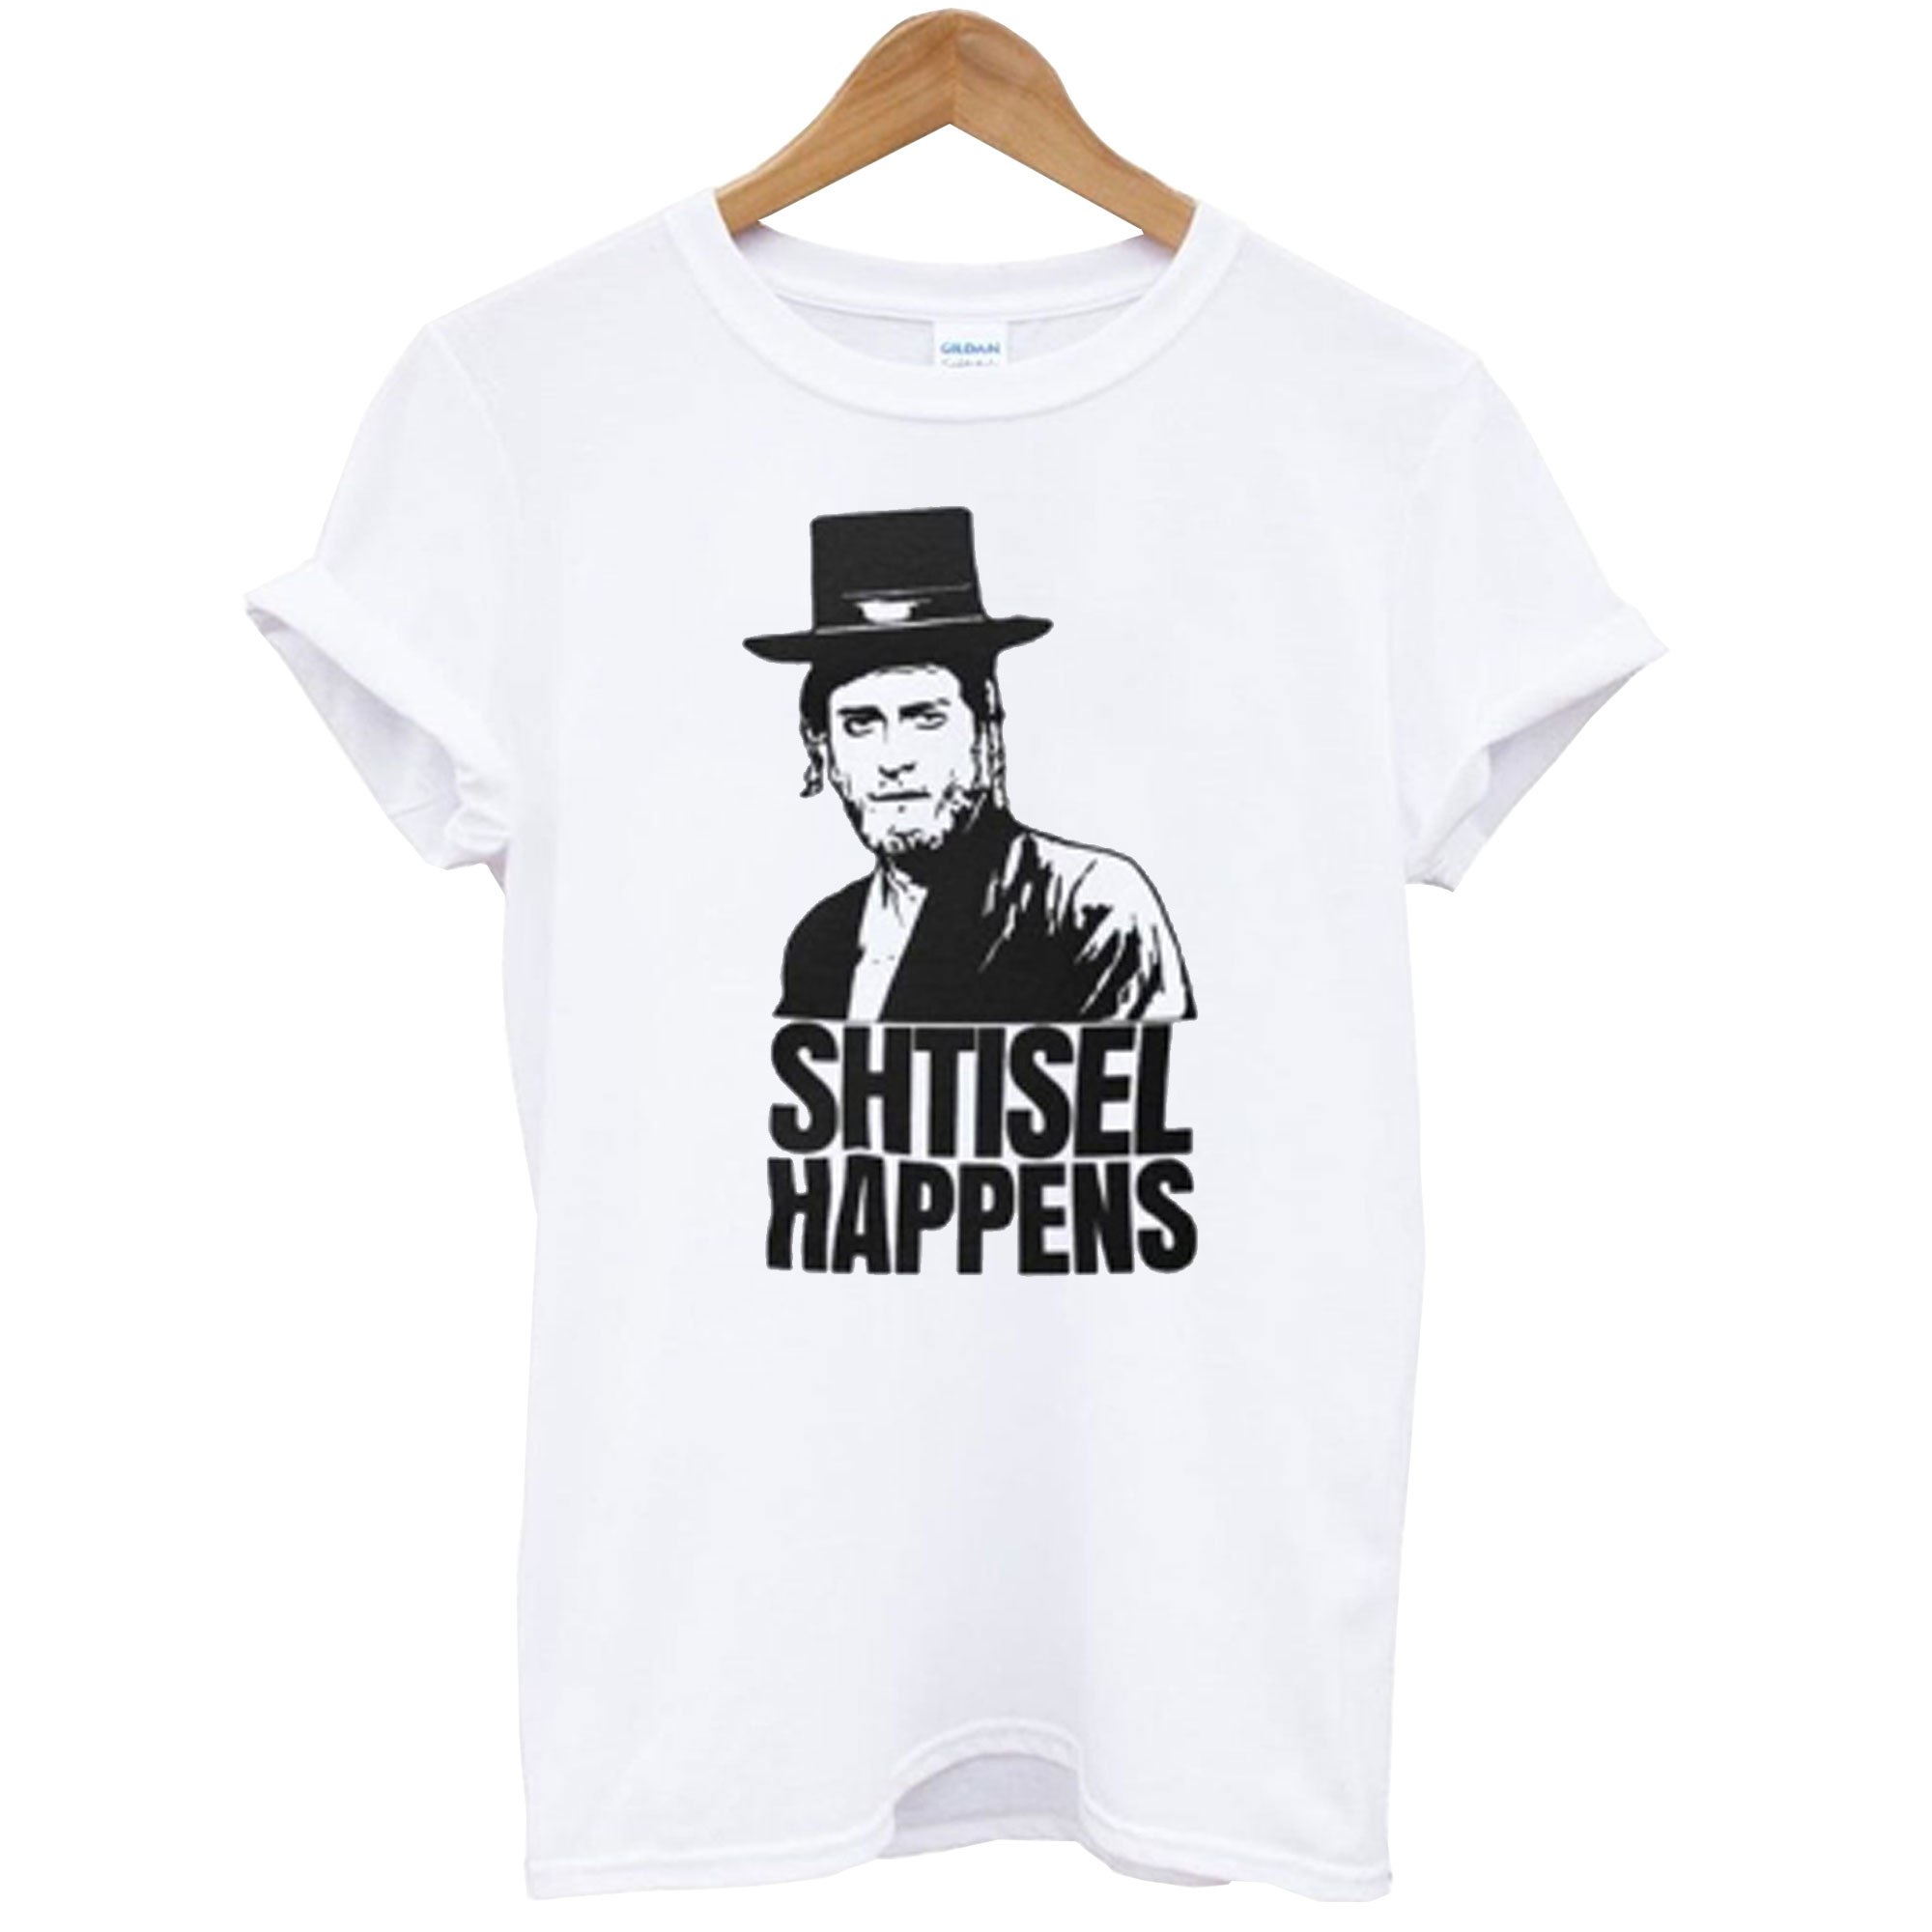 Shtisel Happens T-Shirt